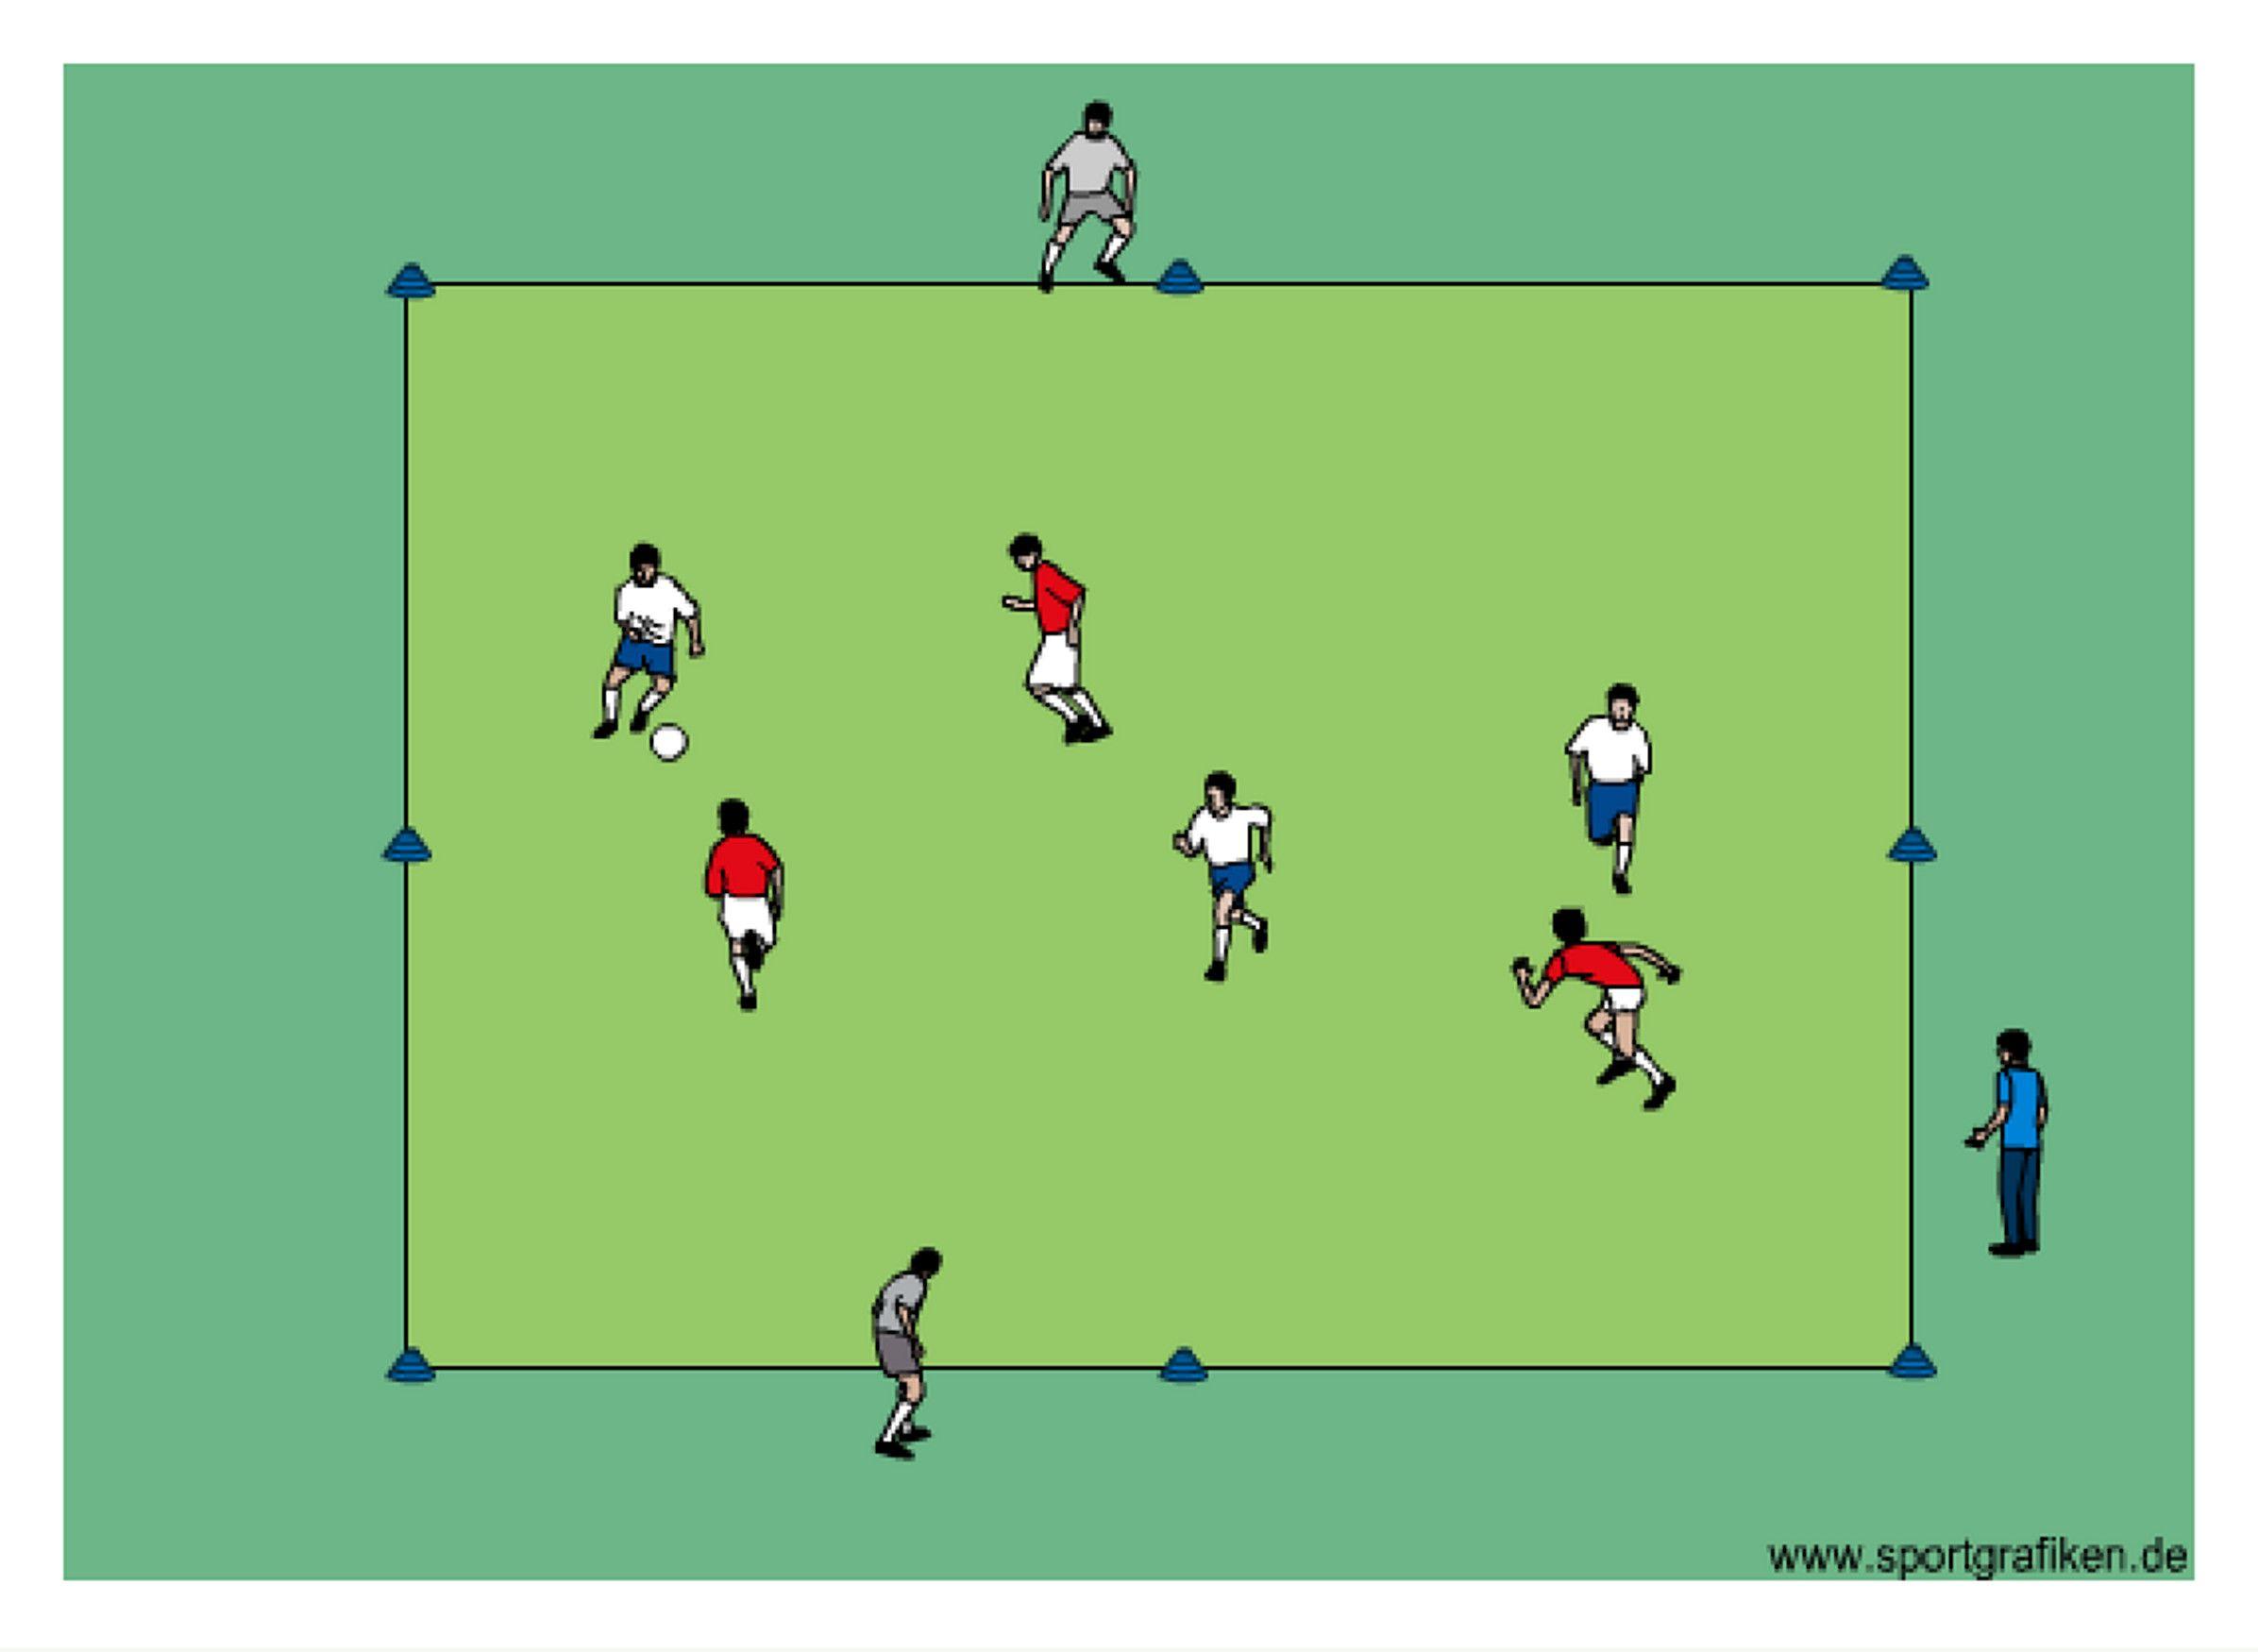 Soccer 3v3 Moving Targets Training Drill Soccer training